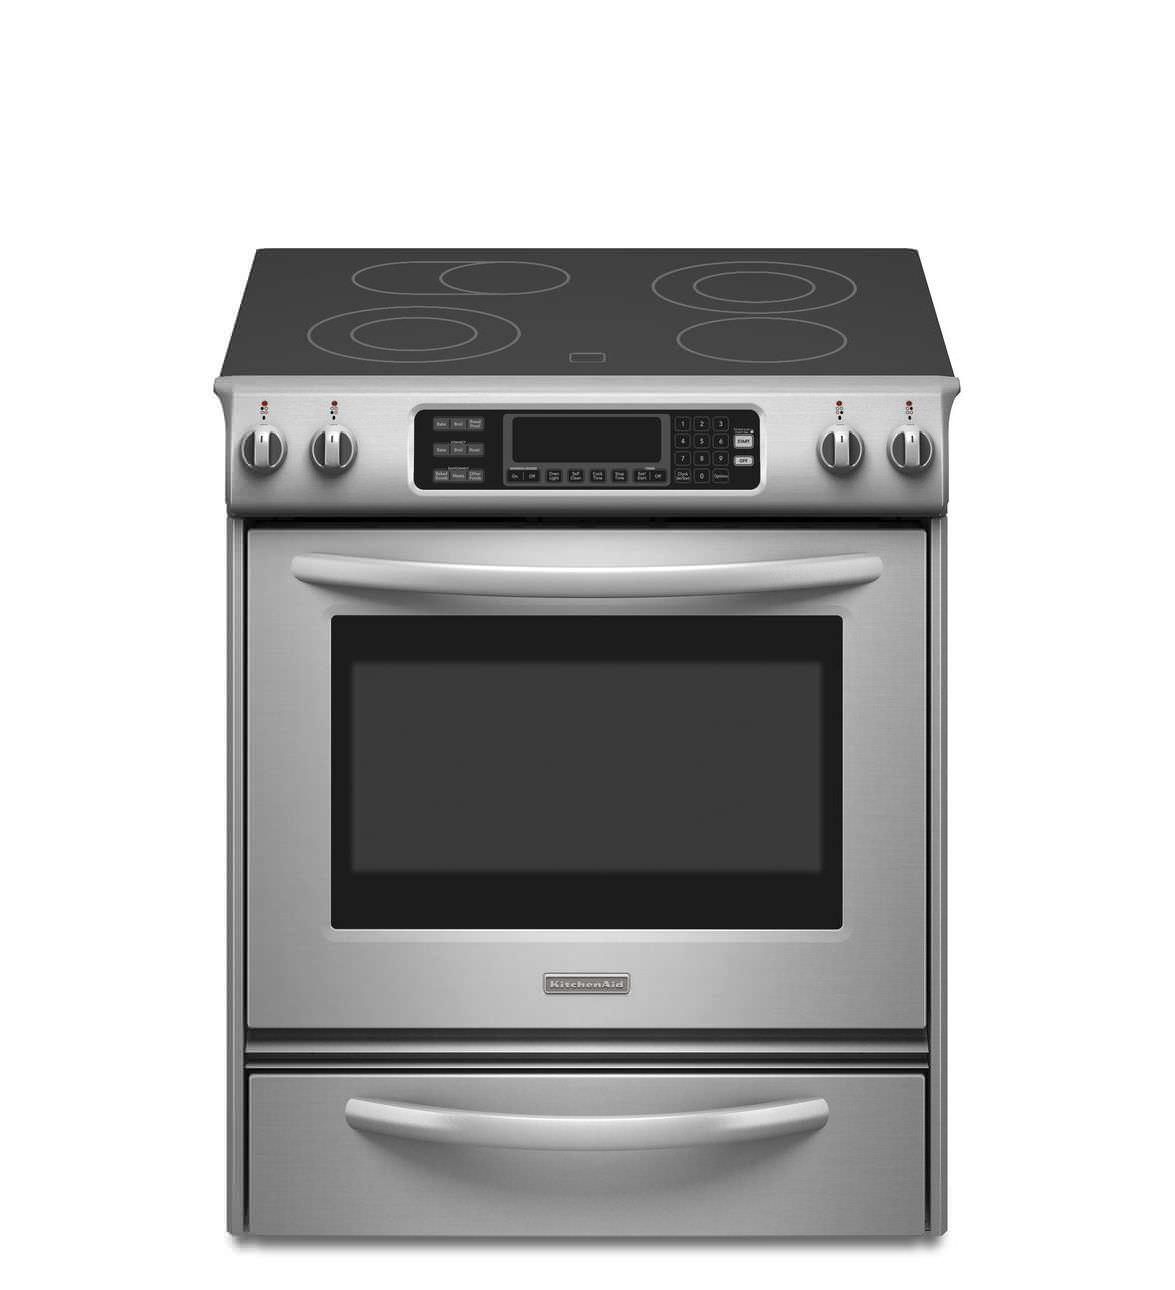 Electric Range Cooker Kess907sss